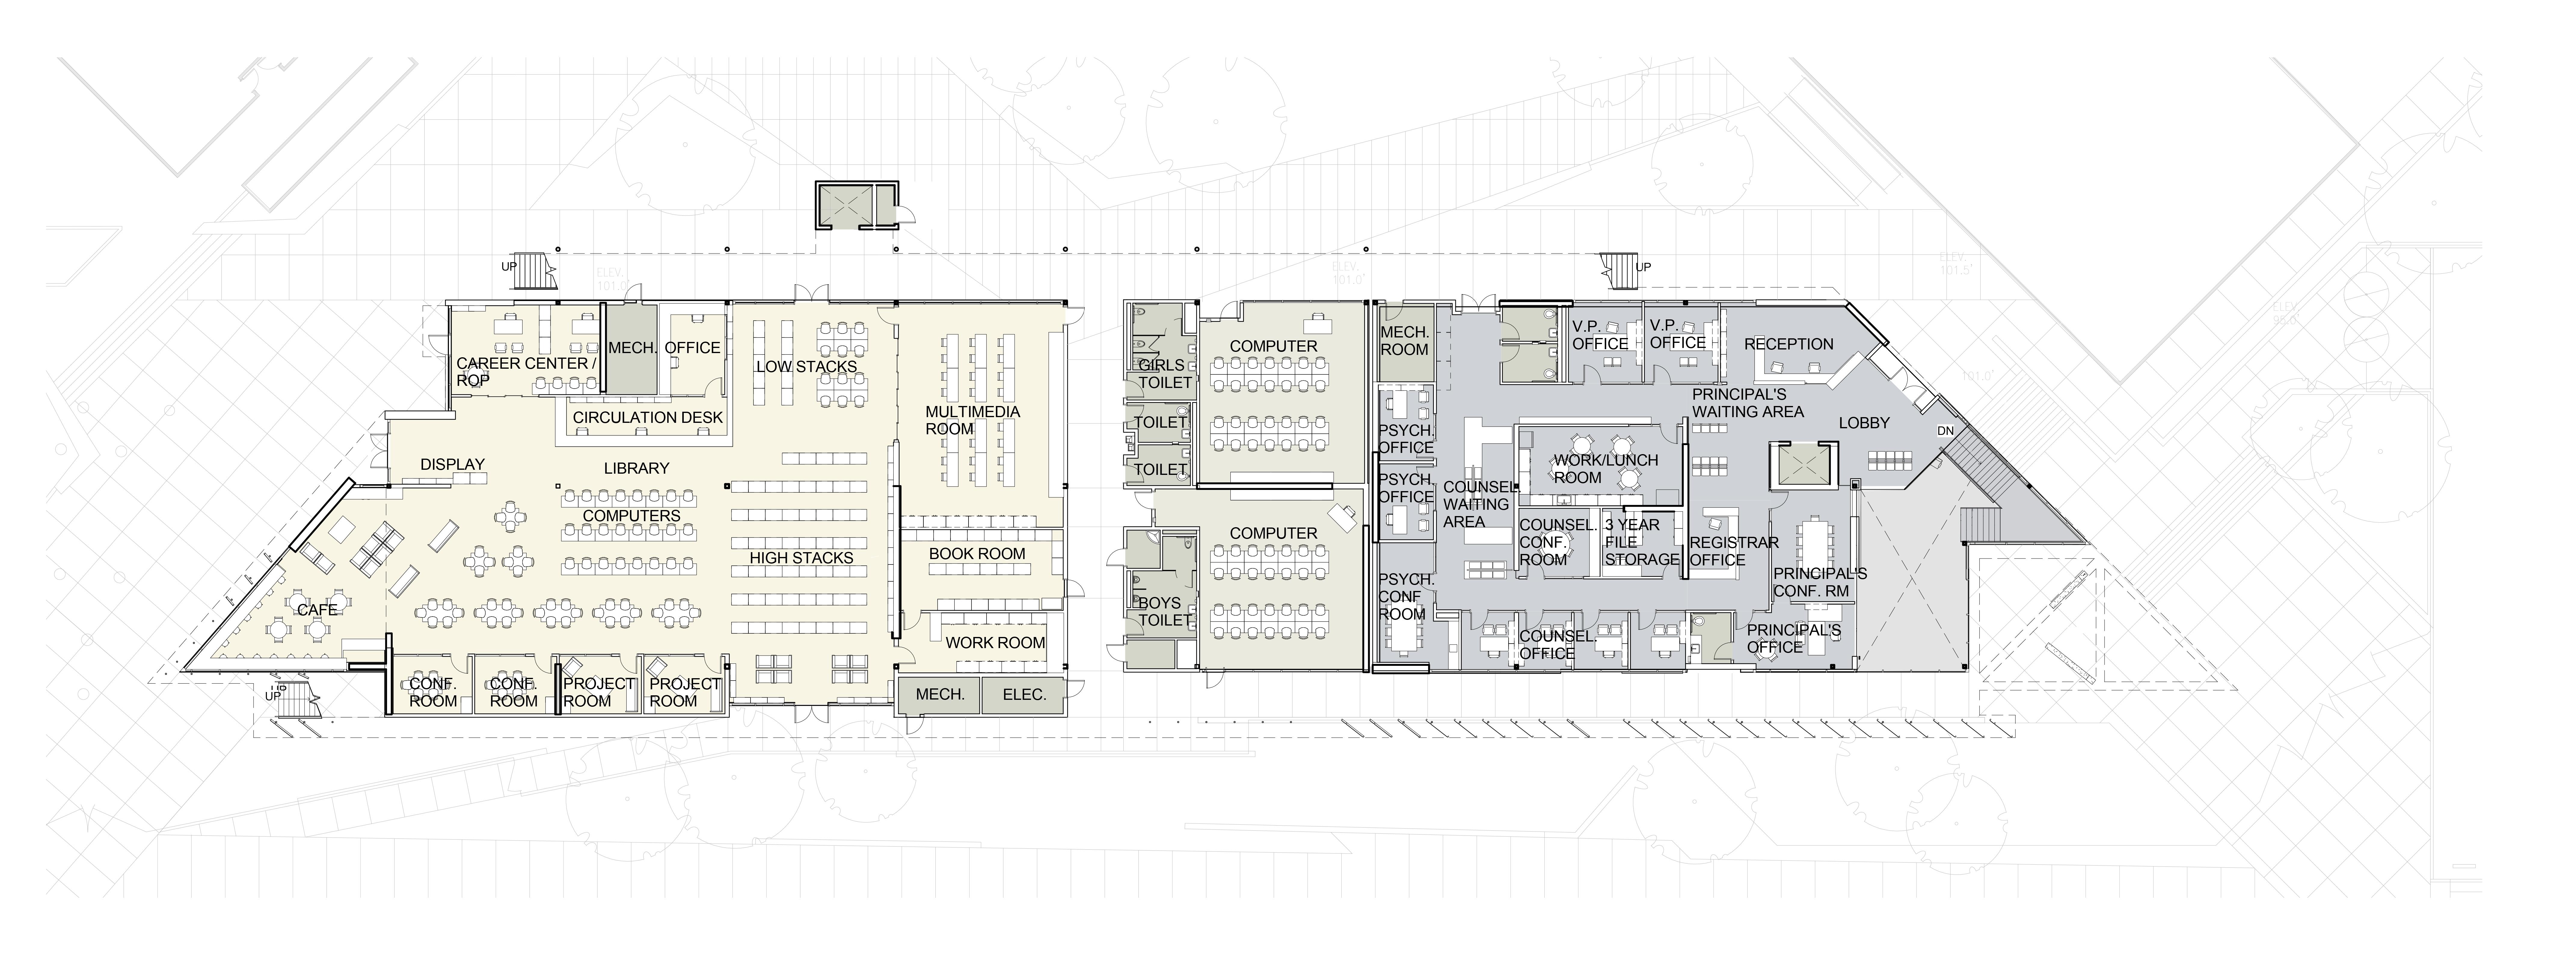 level 2 (courtyard) plan